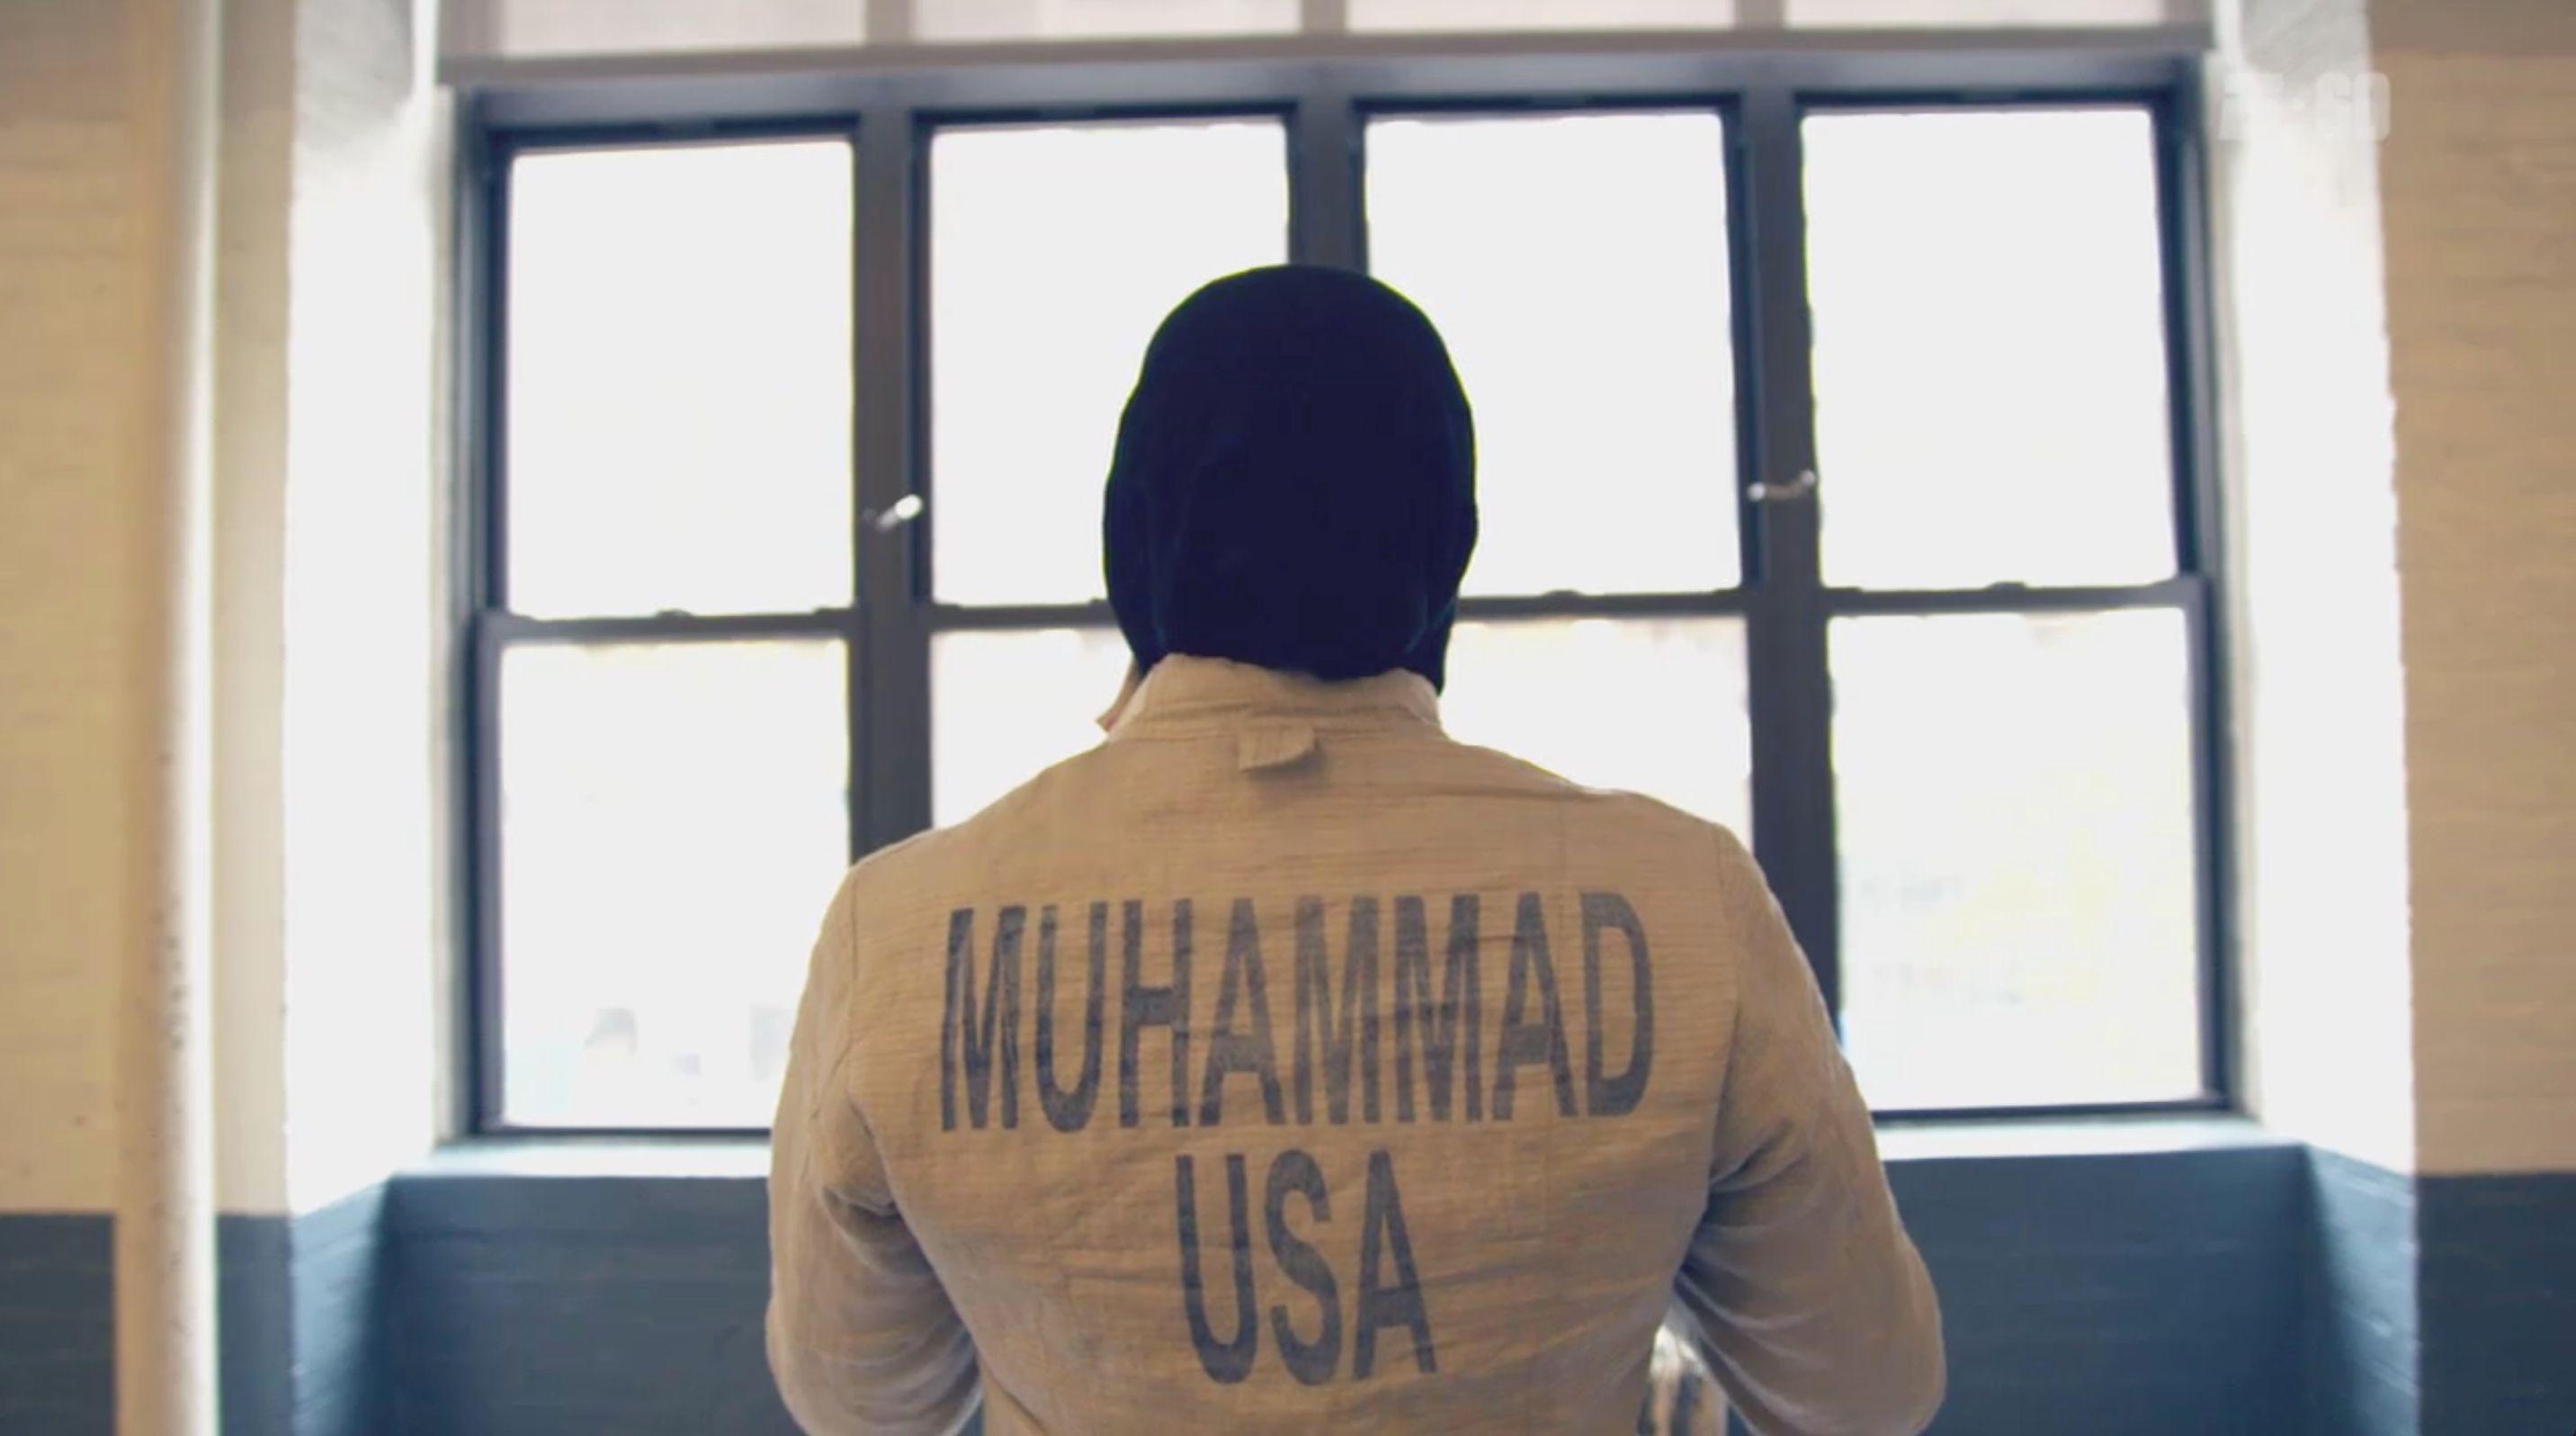 American: Ibtihaj Muhammad